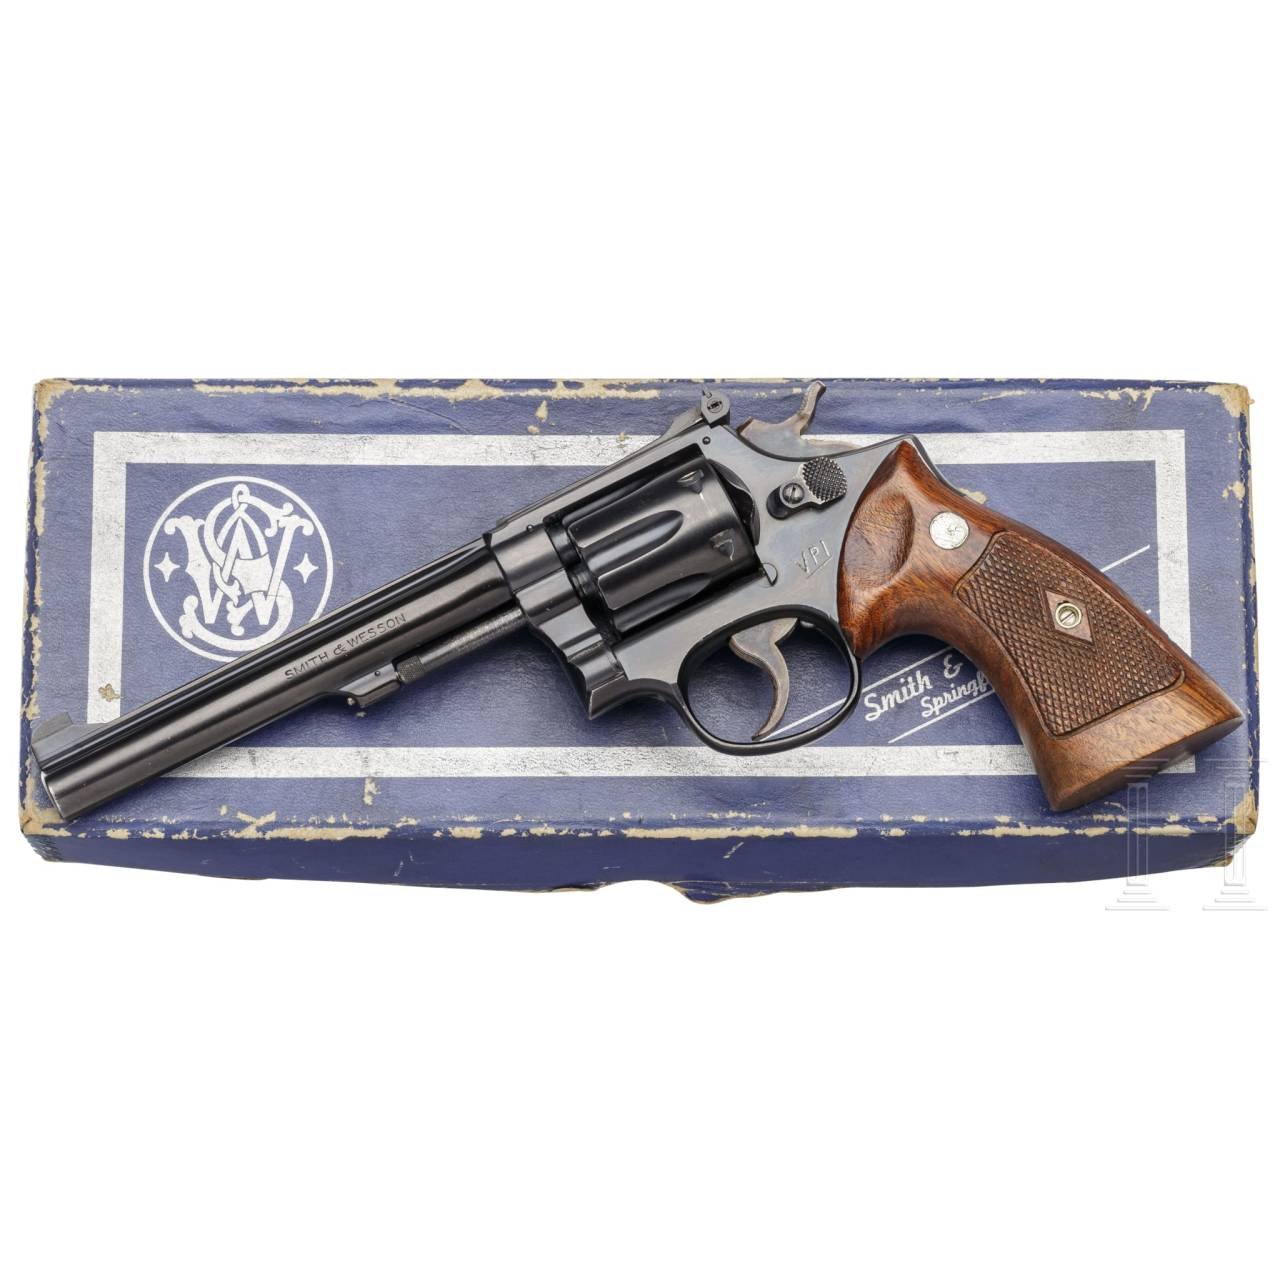 Smith & Wesson Mod. K-22 Masterpiece (Postwar, 3rd Mod. - Pre-Model 17), im Karton, Polizei Dänemark